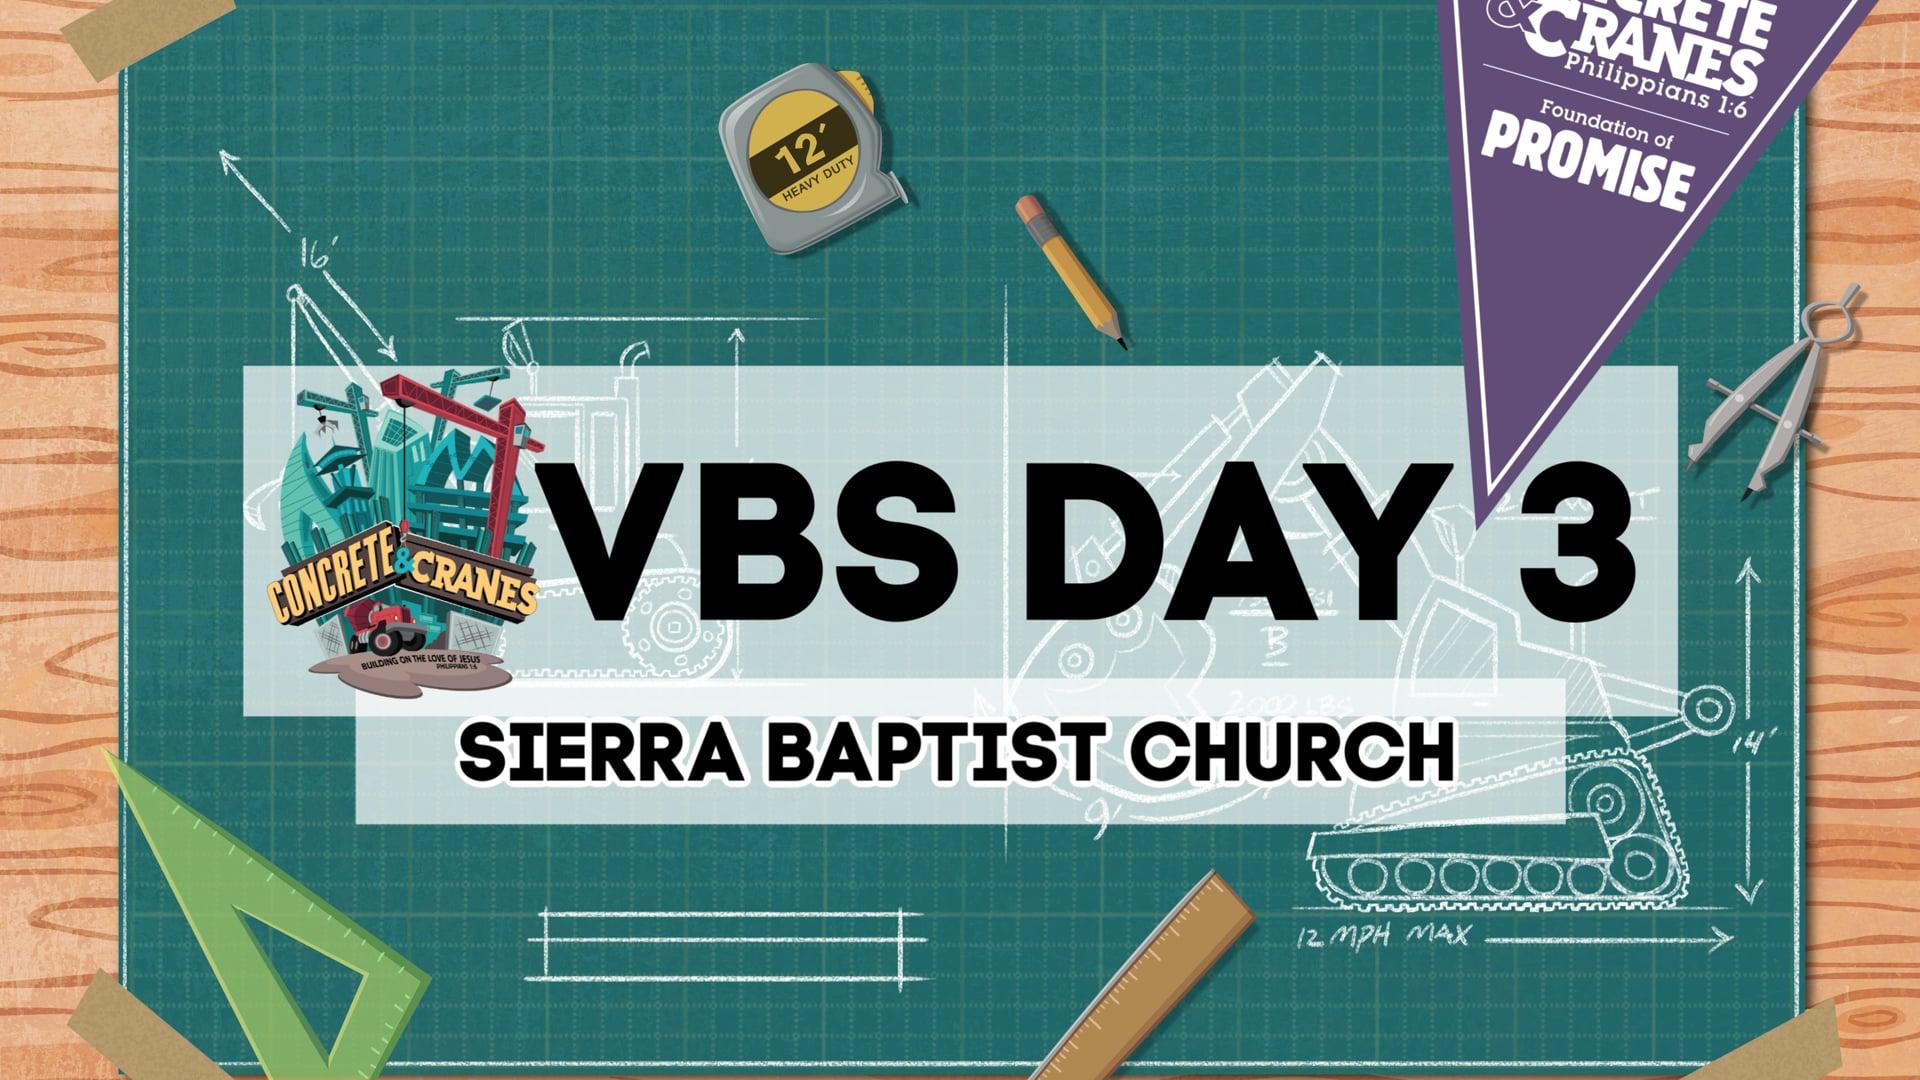 VBS Day 3 - Concrete & Cranes at Sierra Baptist Church